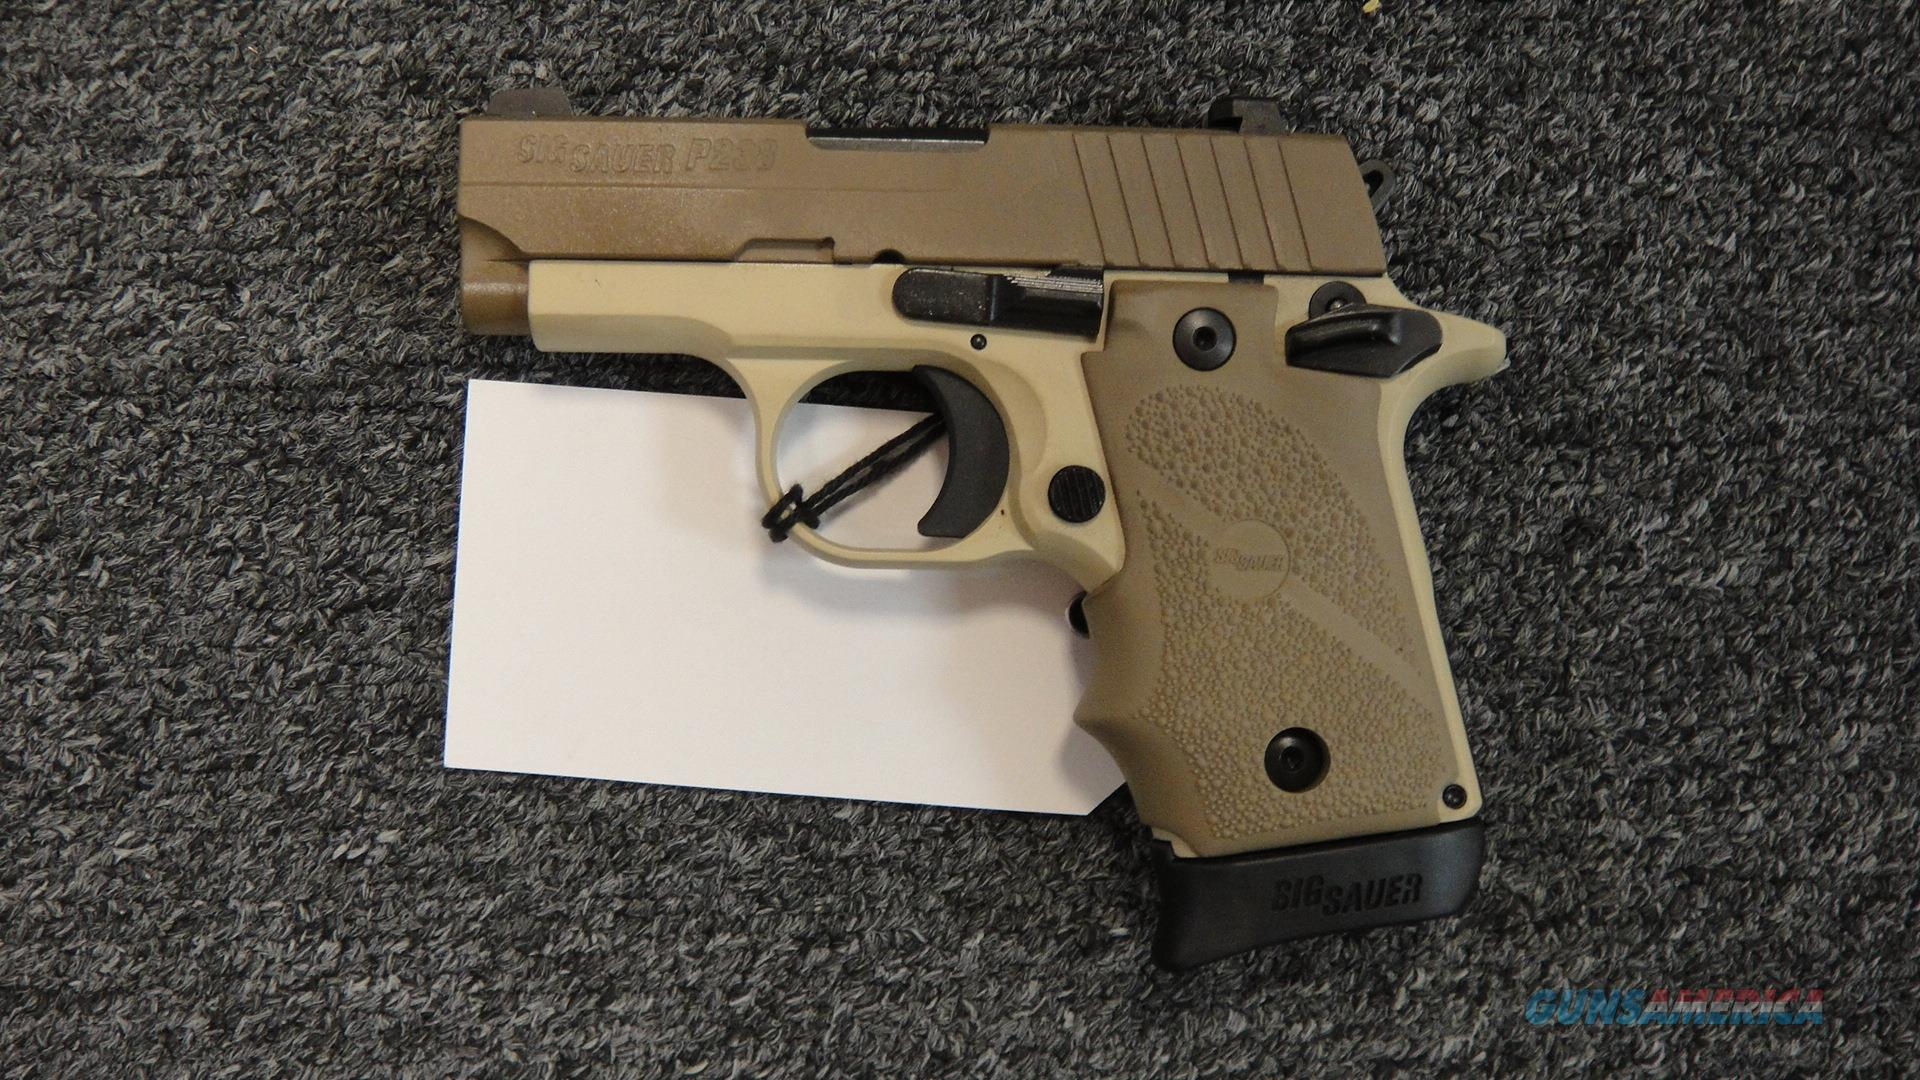 Sig Sauer P238 Desert  Guns > Pistols > Sig - Sauer/Sigarms Pistols > P238